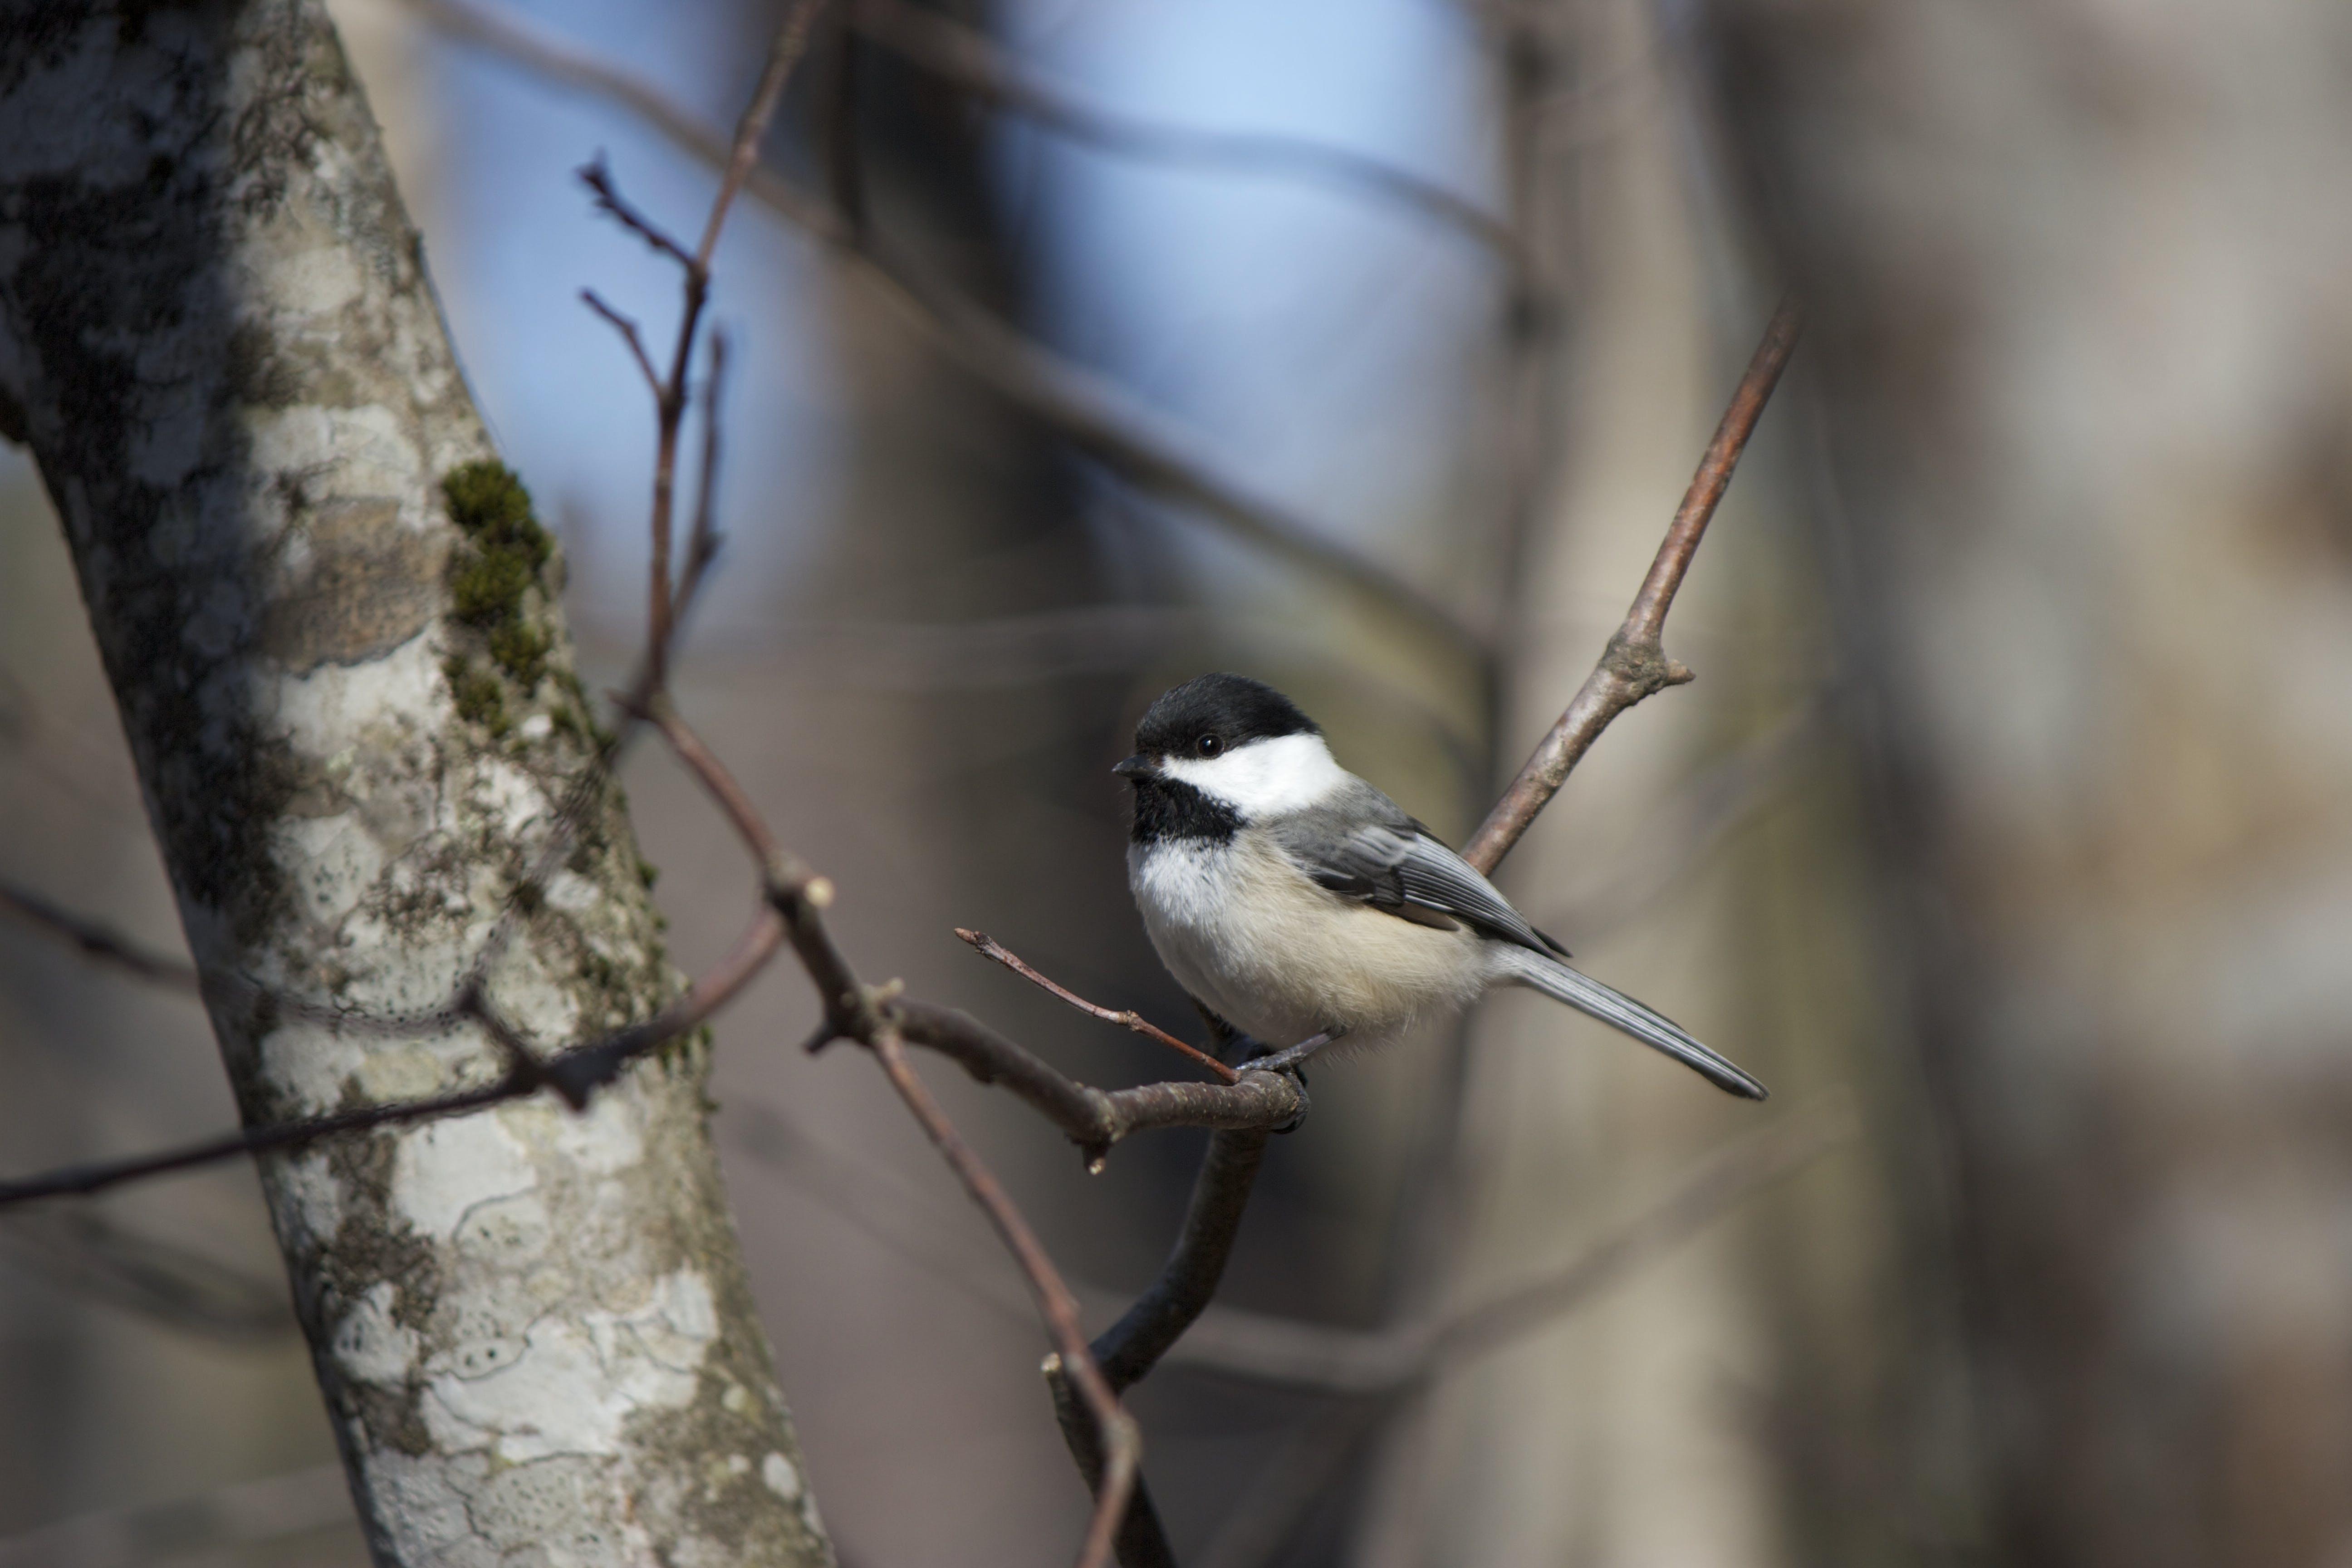 Bird Perch on Tree Trunks